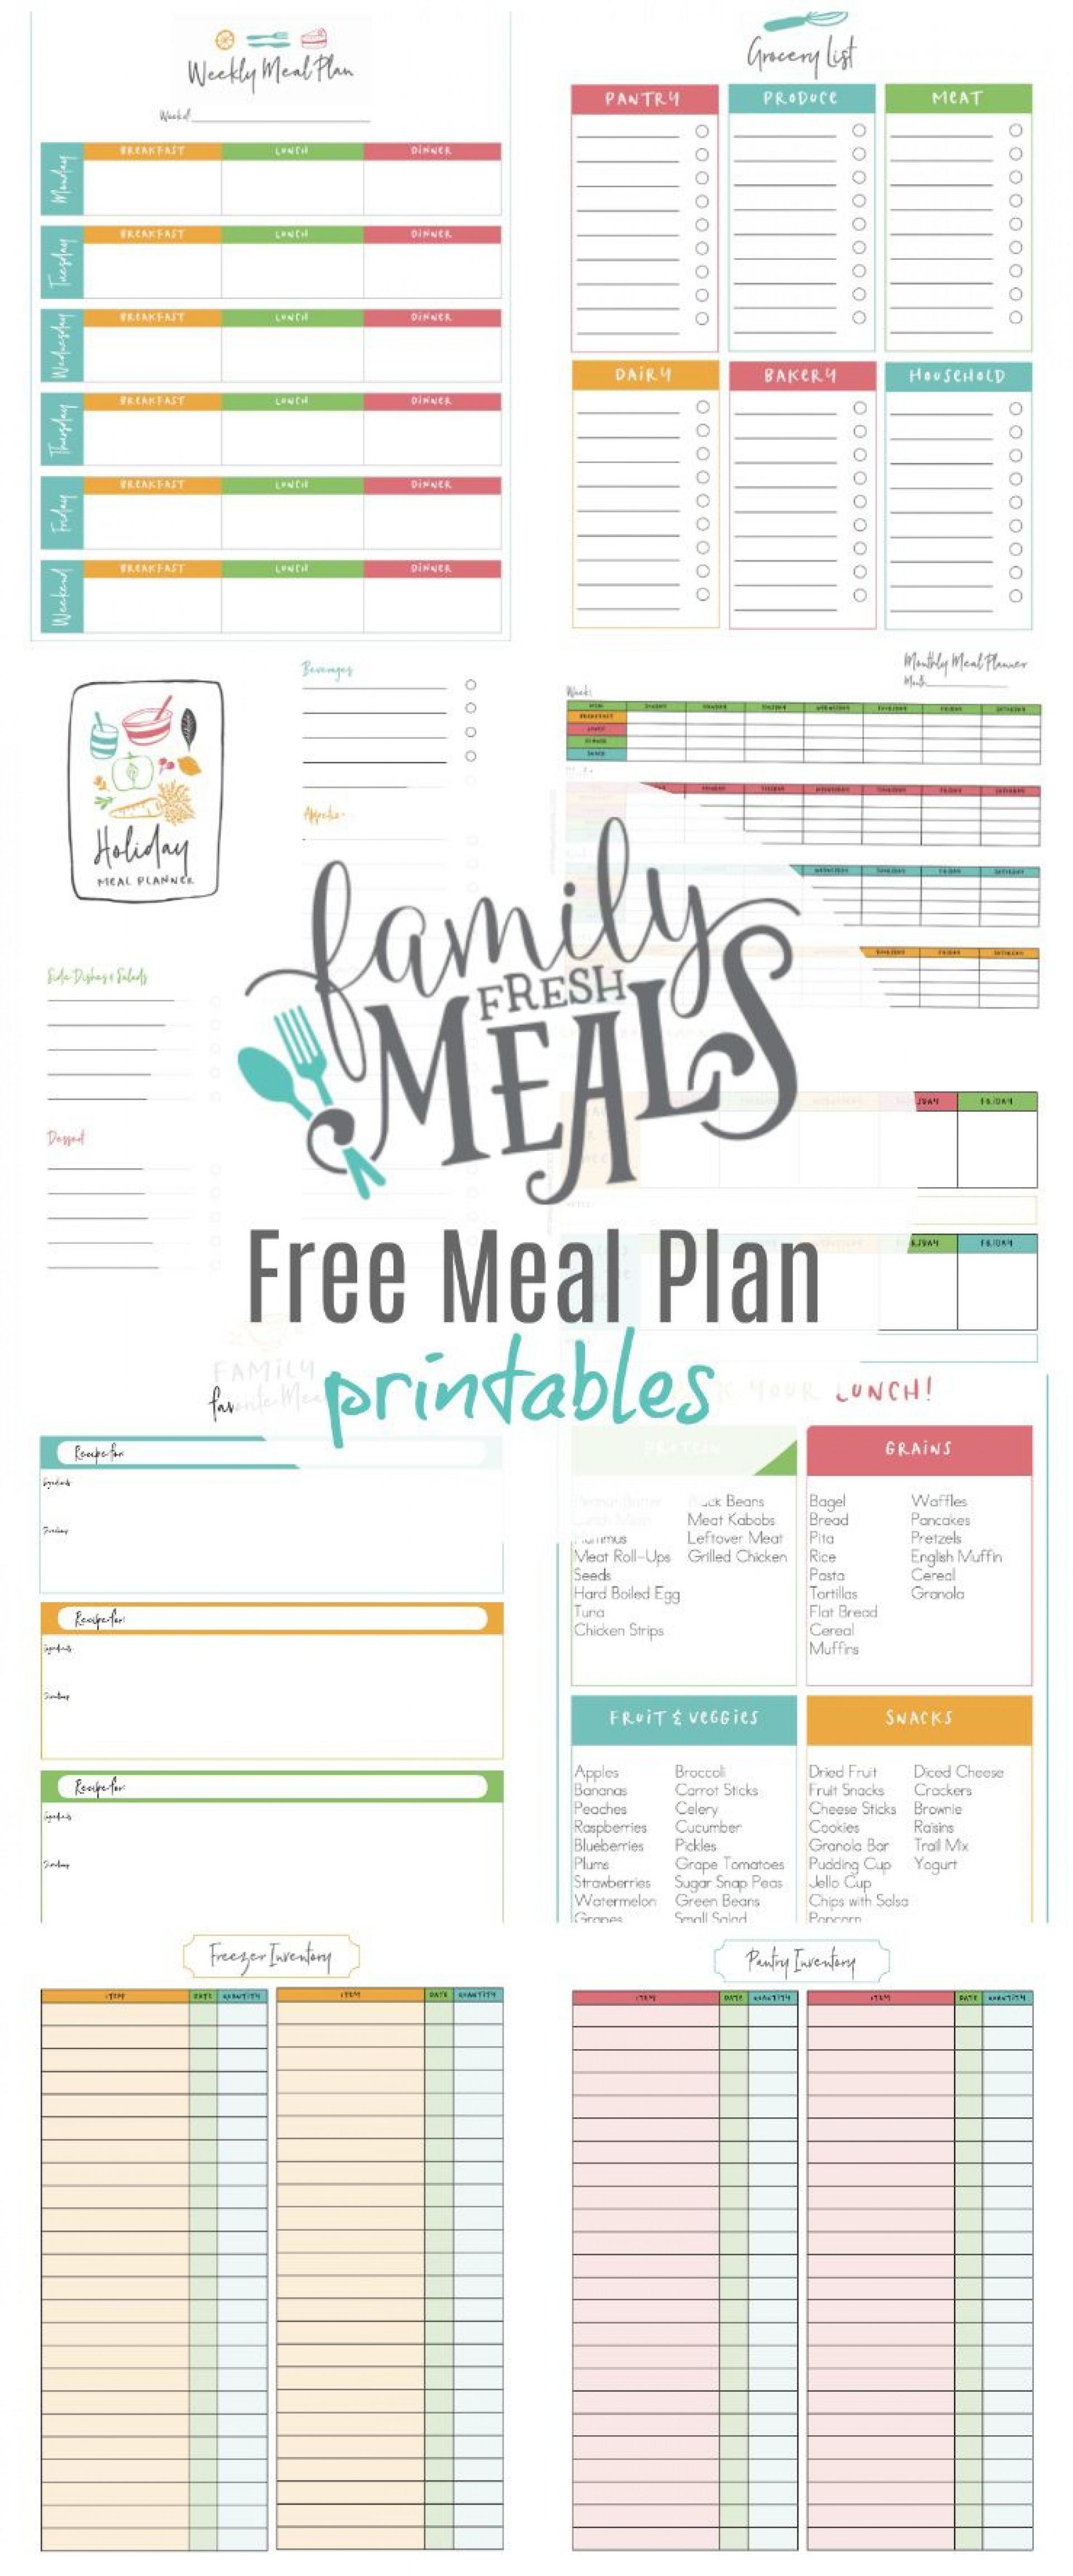 003 Unbelievable Meal Plan Printable Pdf Photo  Worksheet Downloadable Template Sheet1920